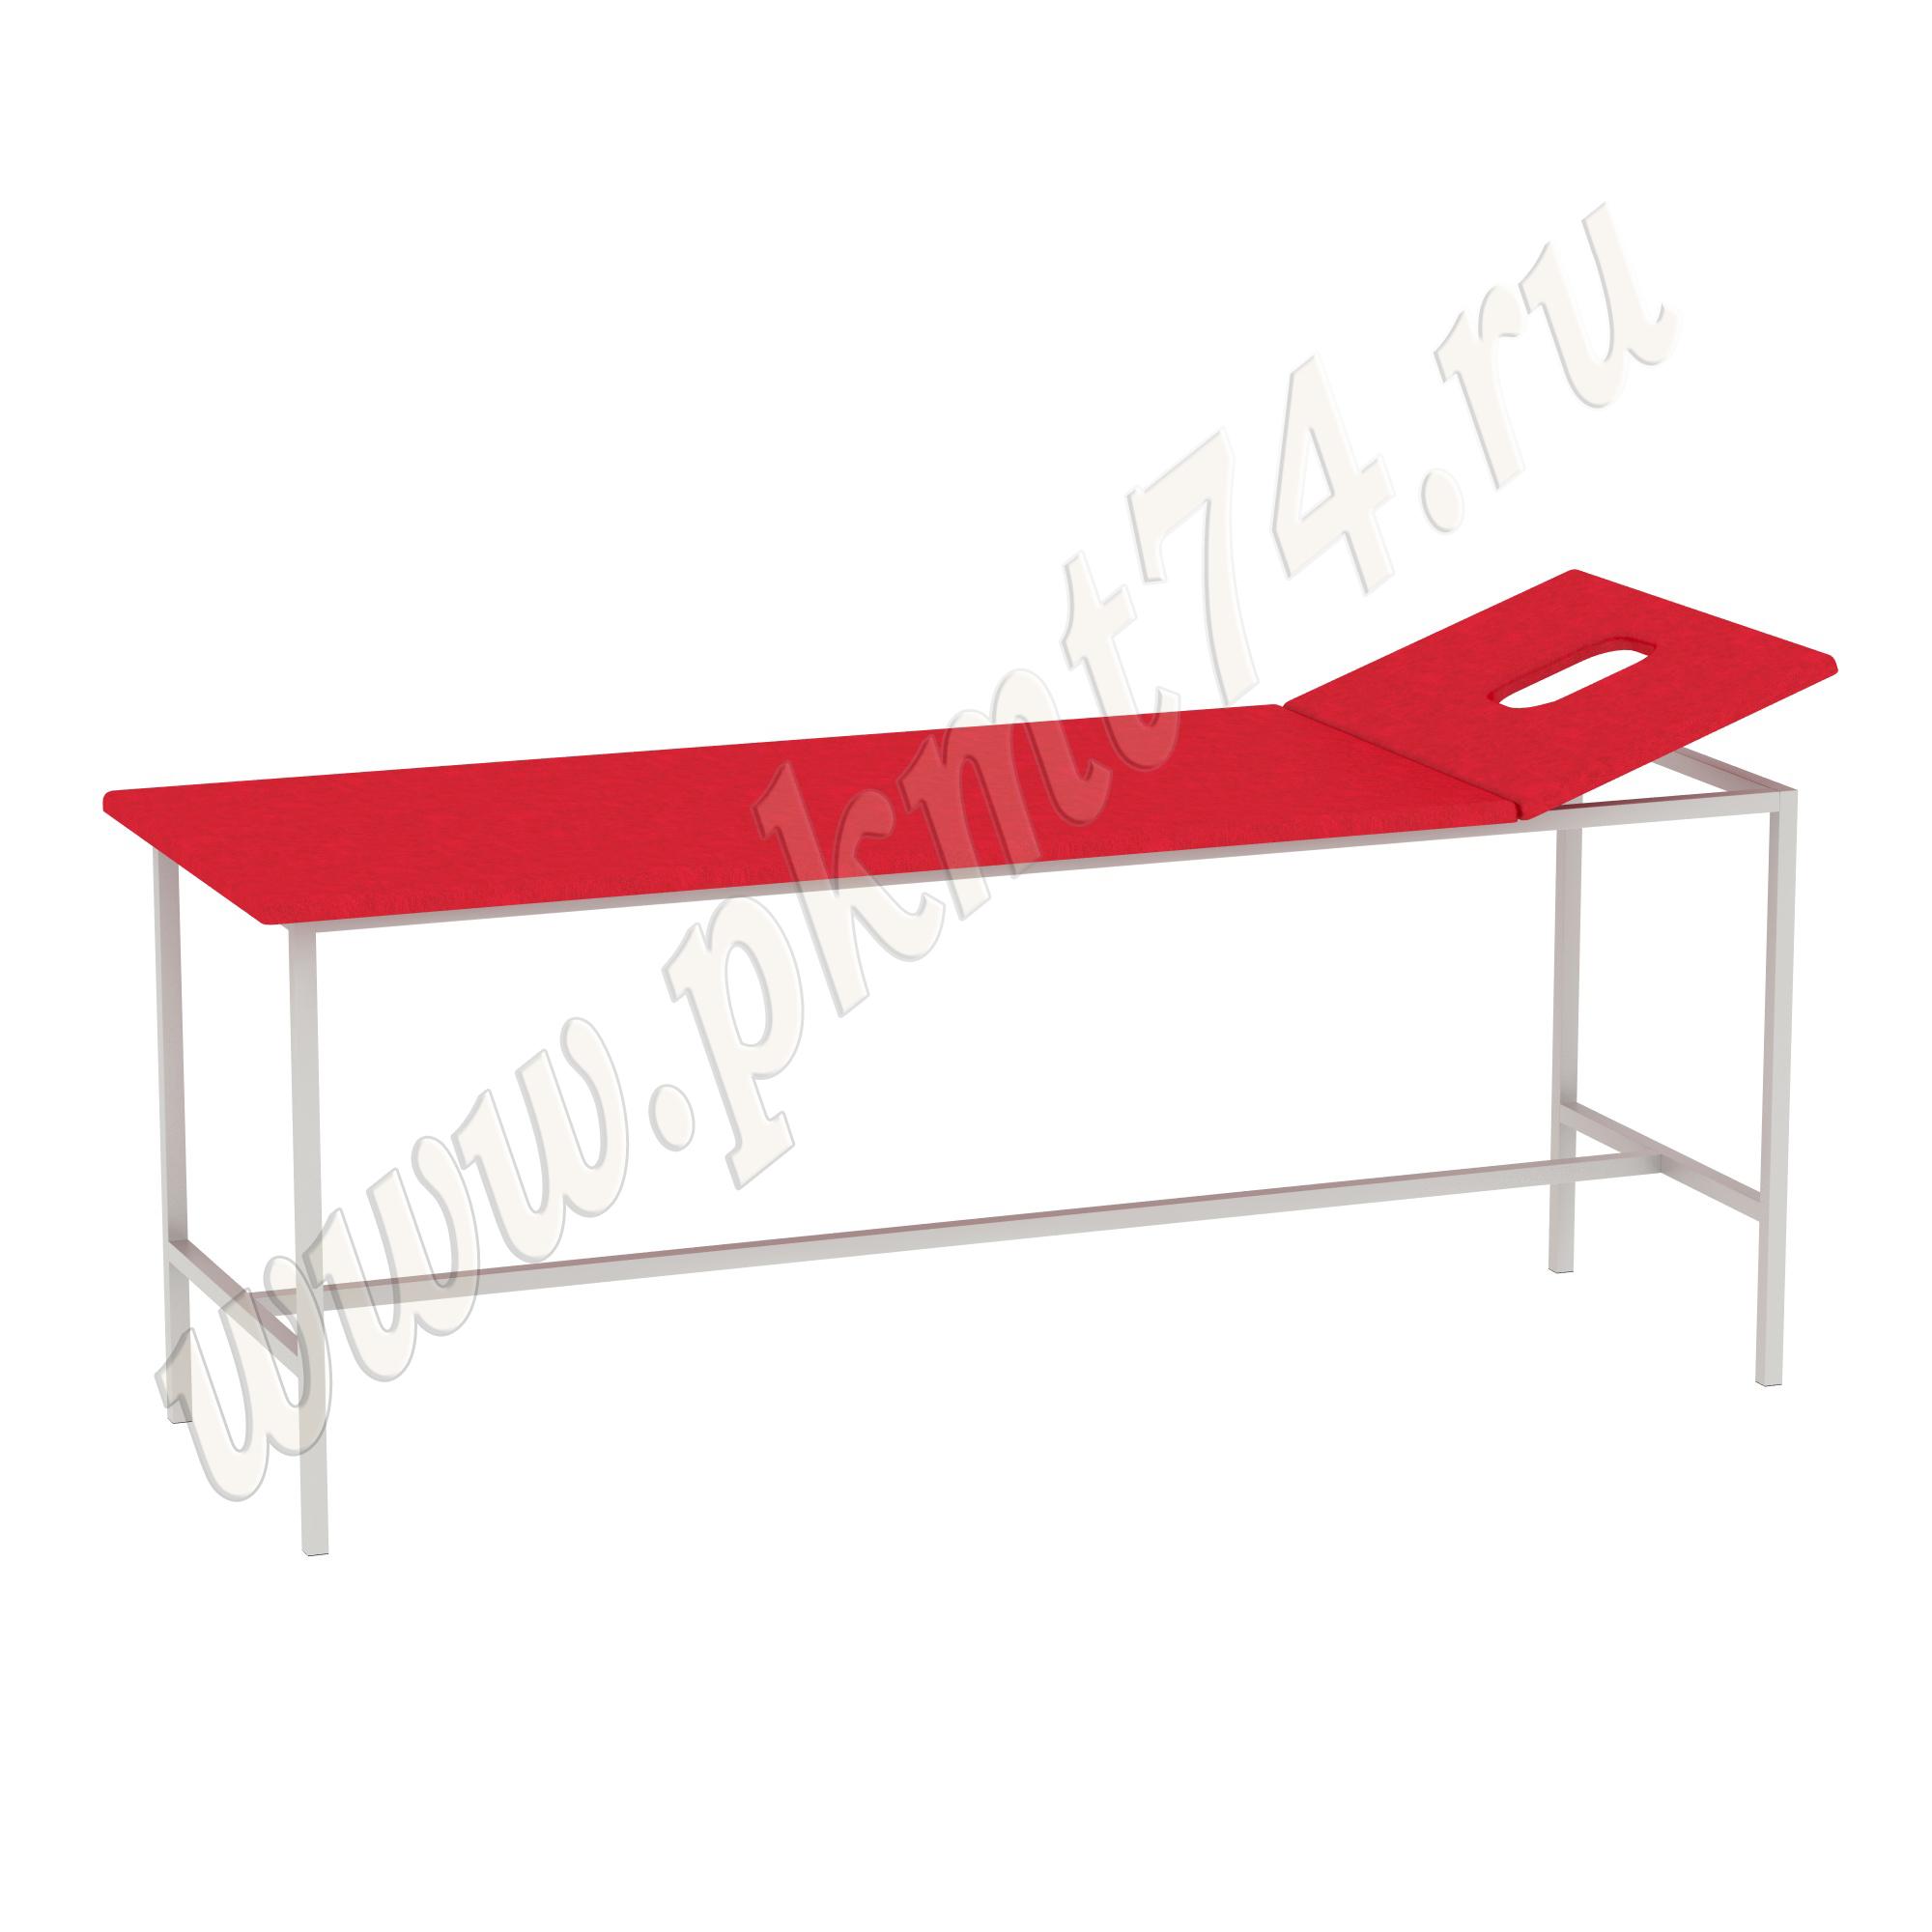 Стол для массажа Мт-05-10-3 Кож. зам Красный